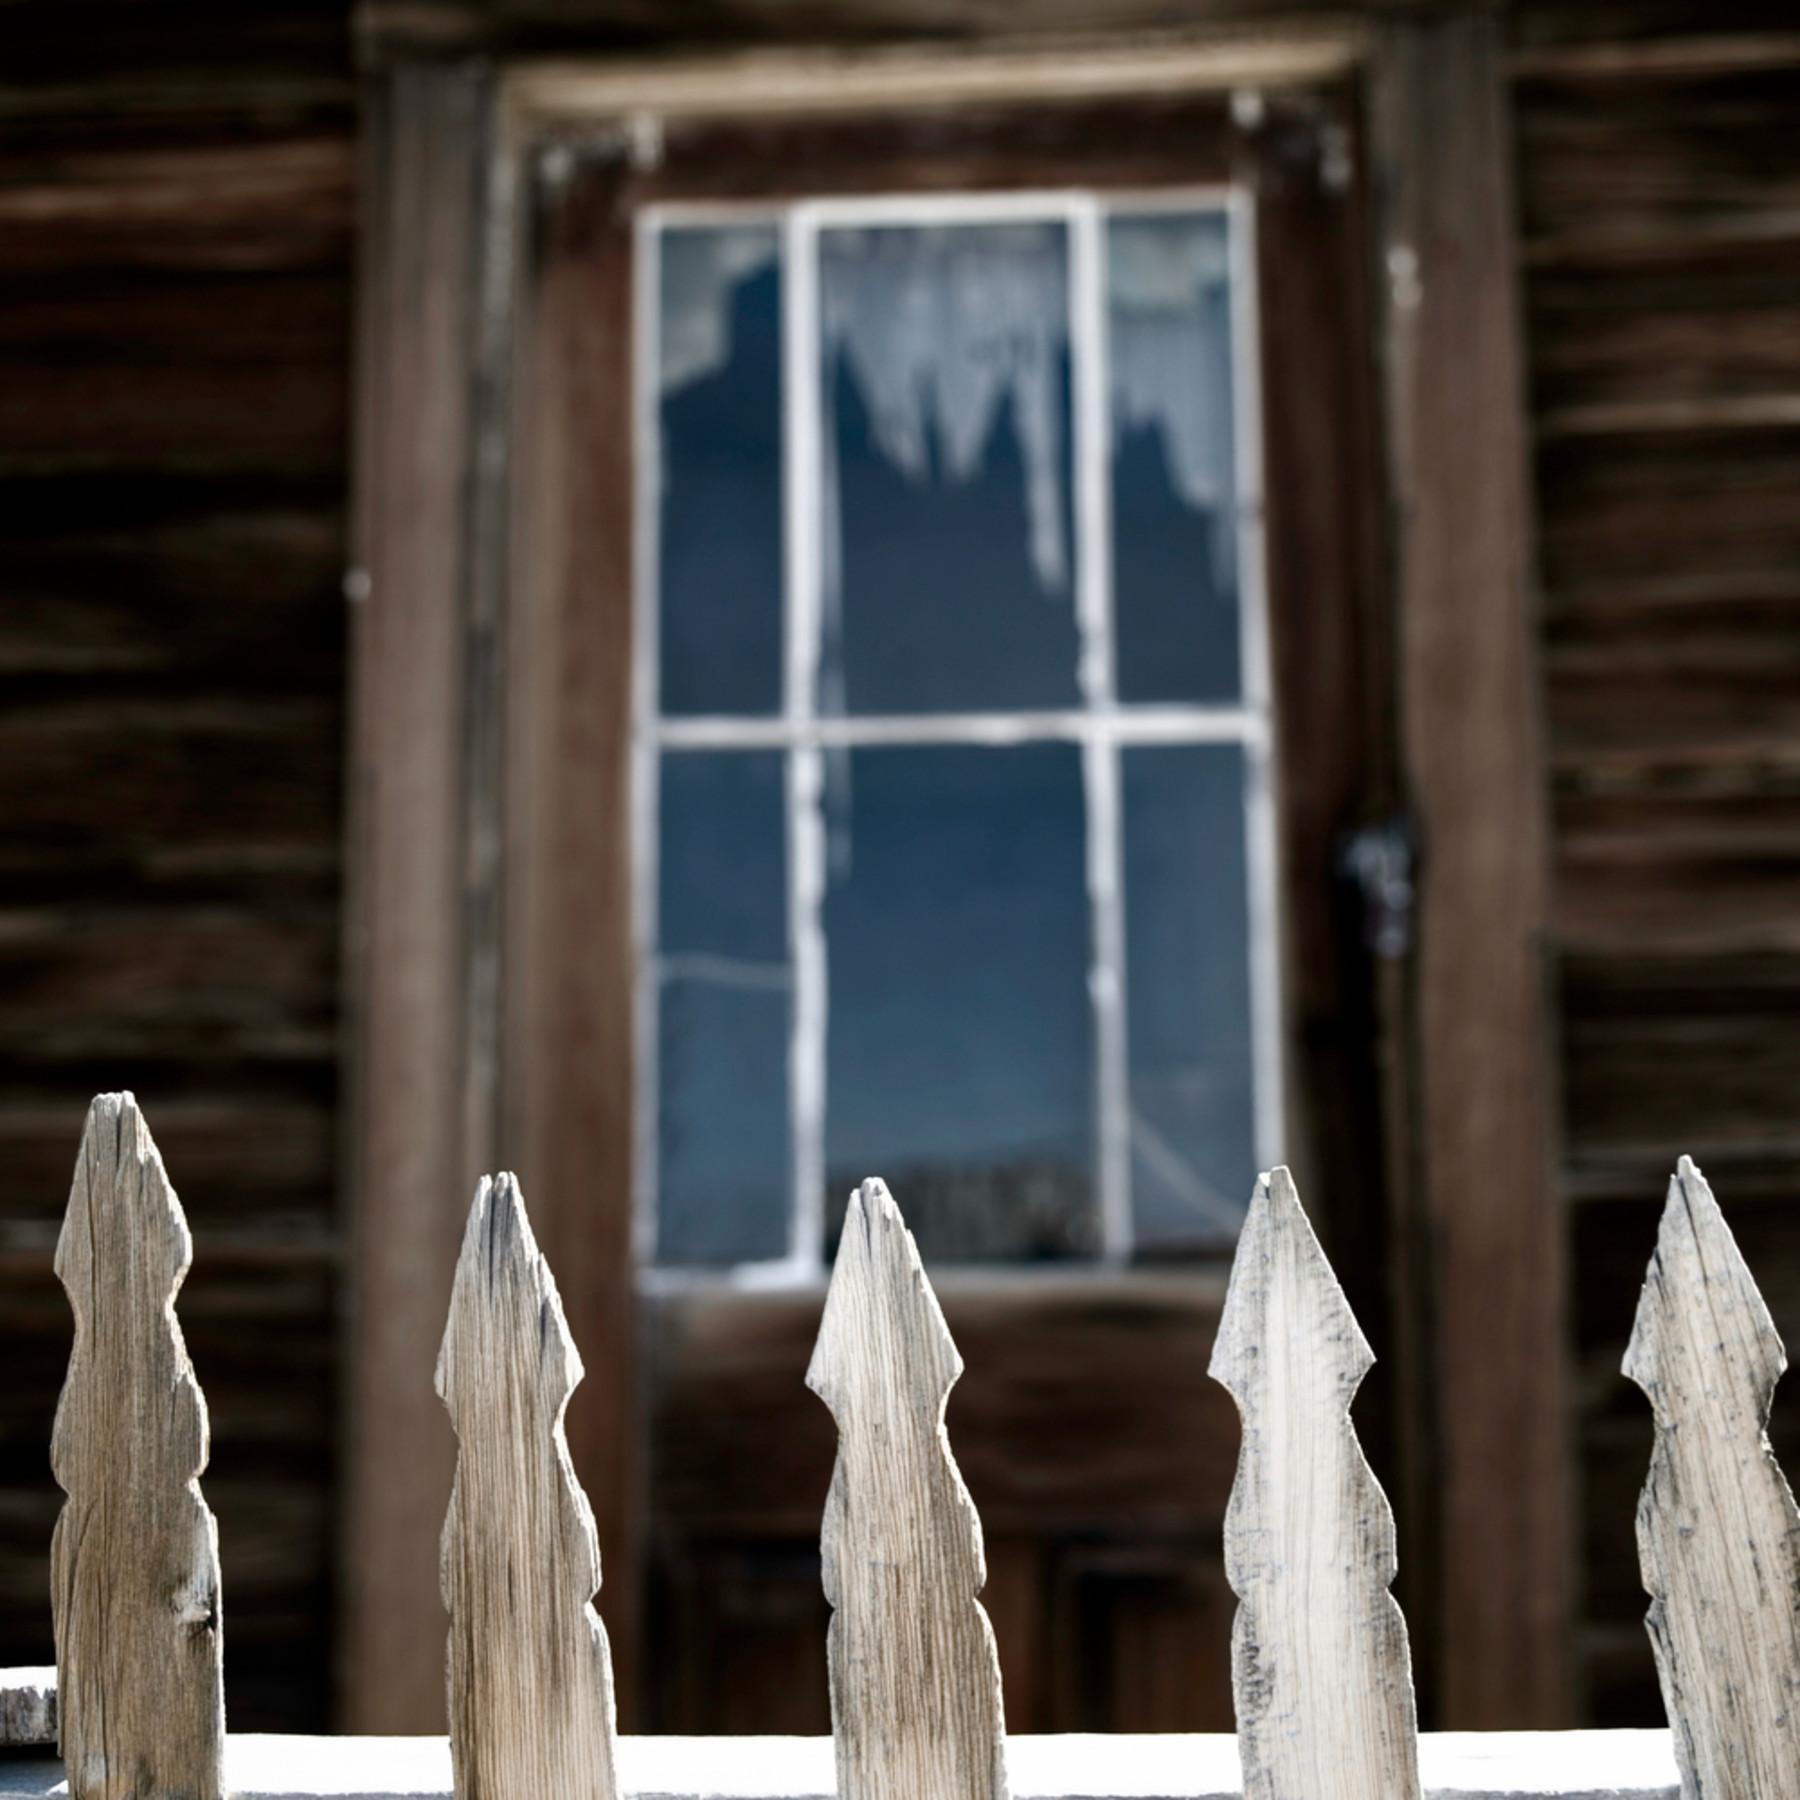 Settler s window phycsd